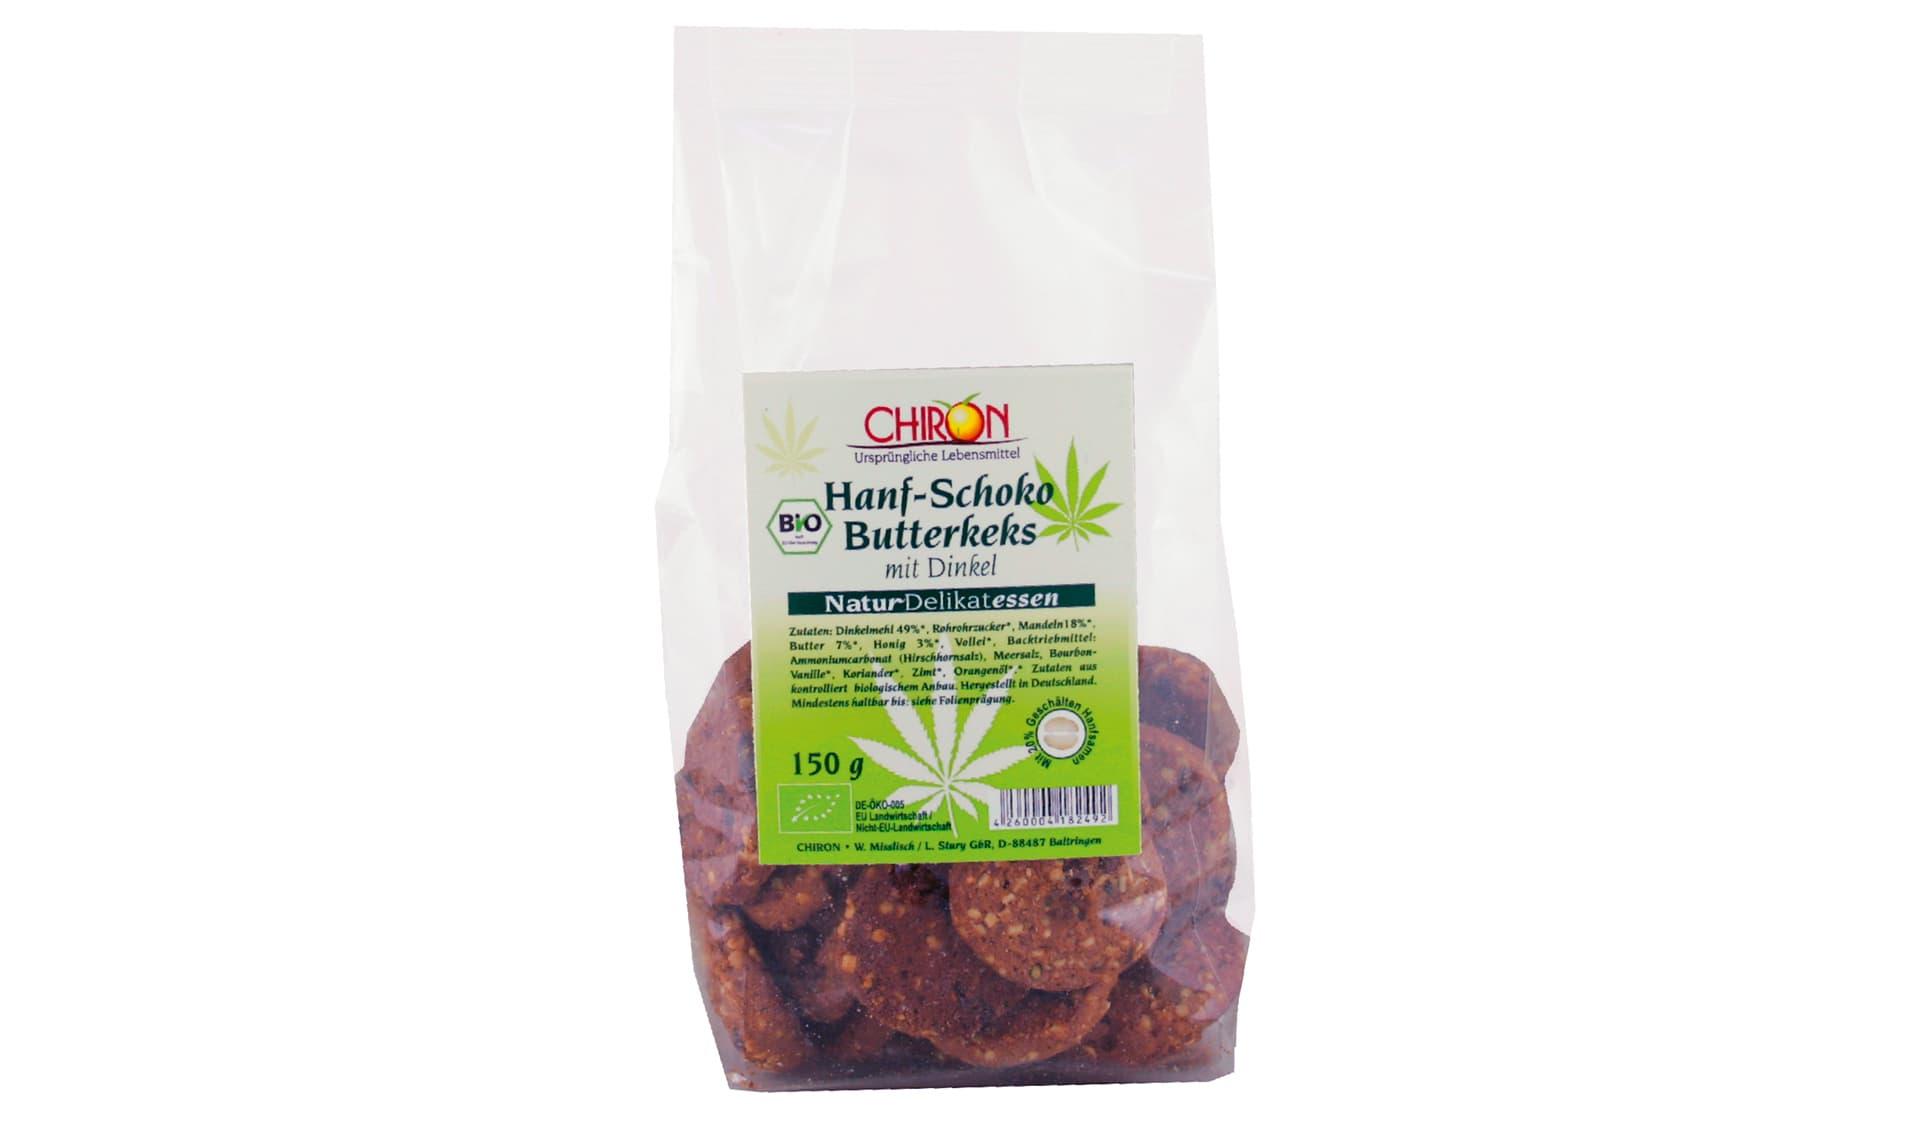 Chiron Hanf-Schoko Butterkeks (www.naturdelikatessen.de)